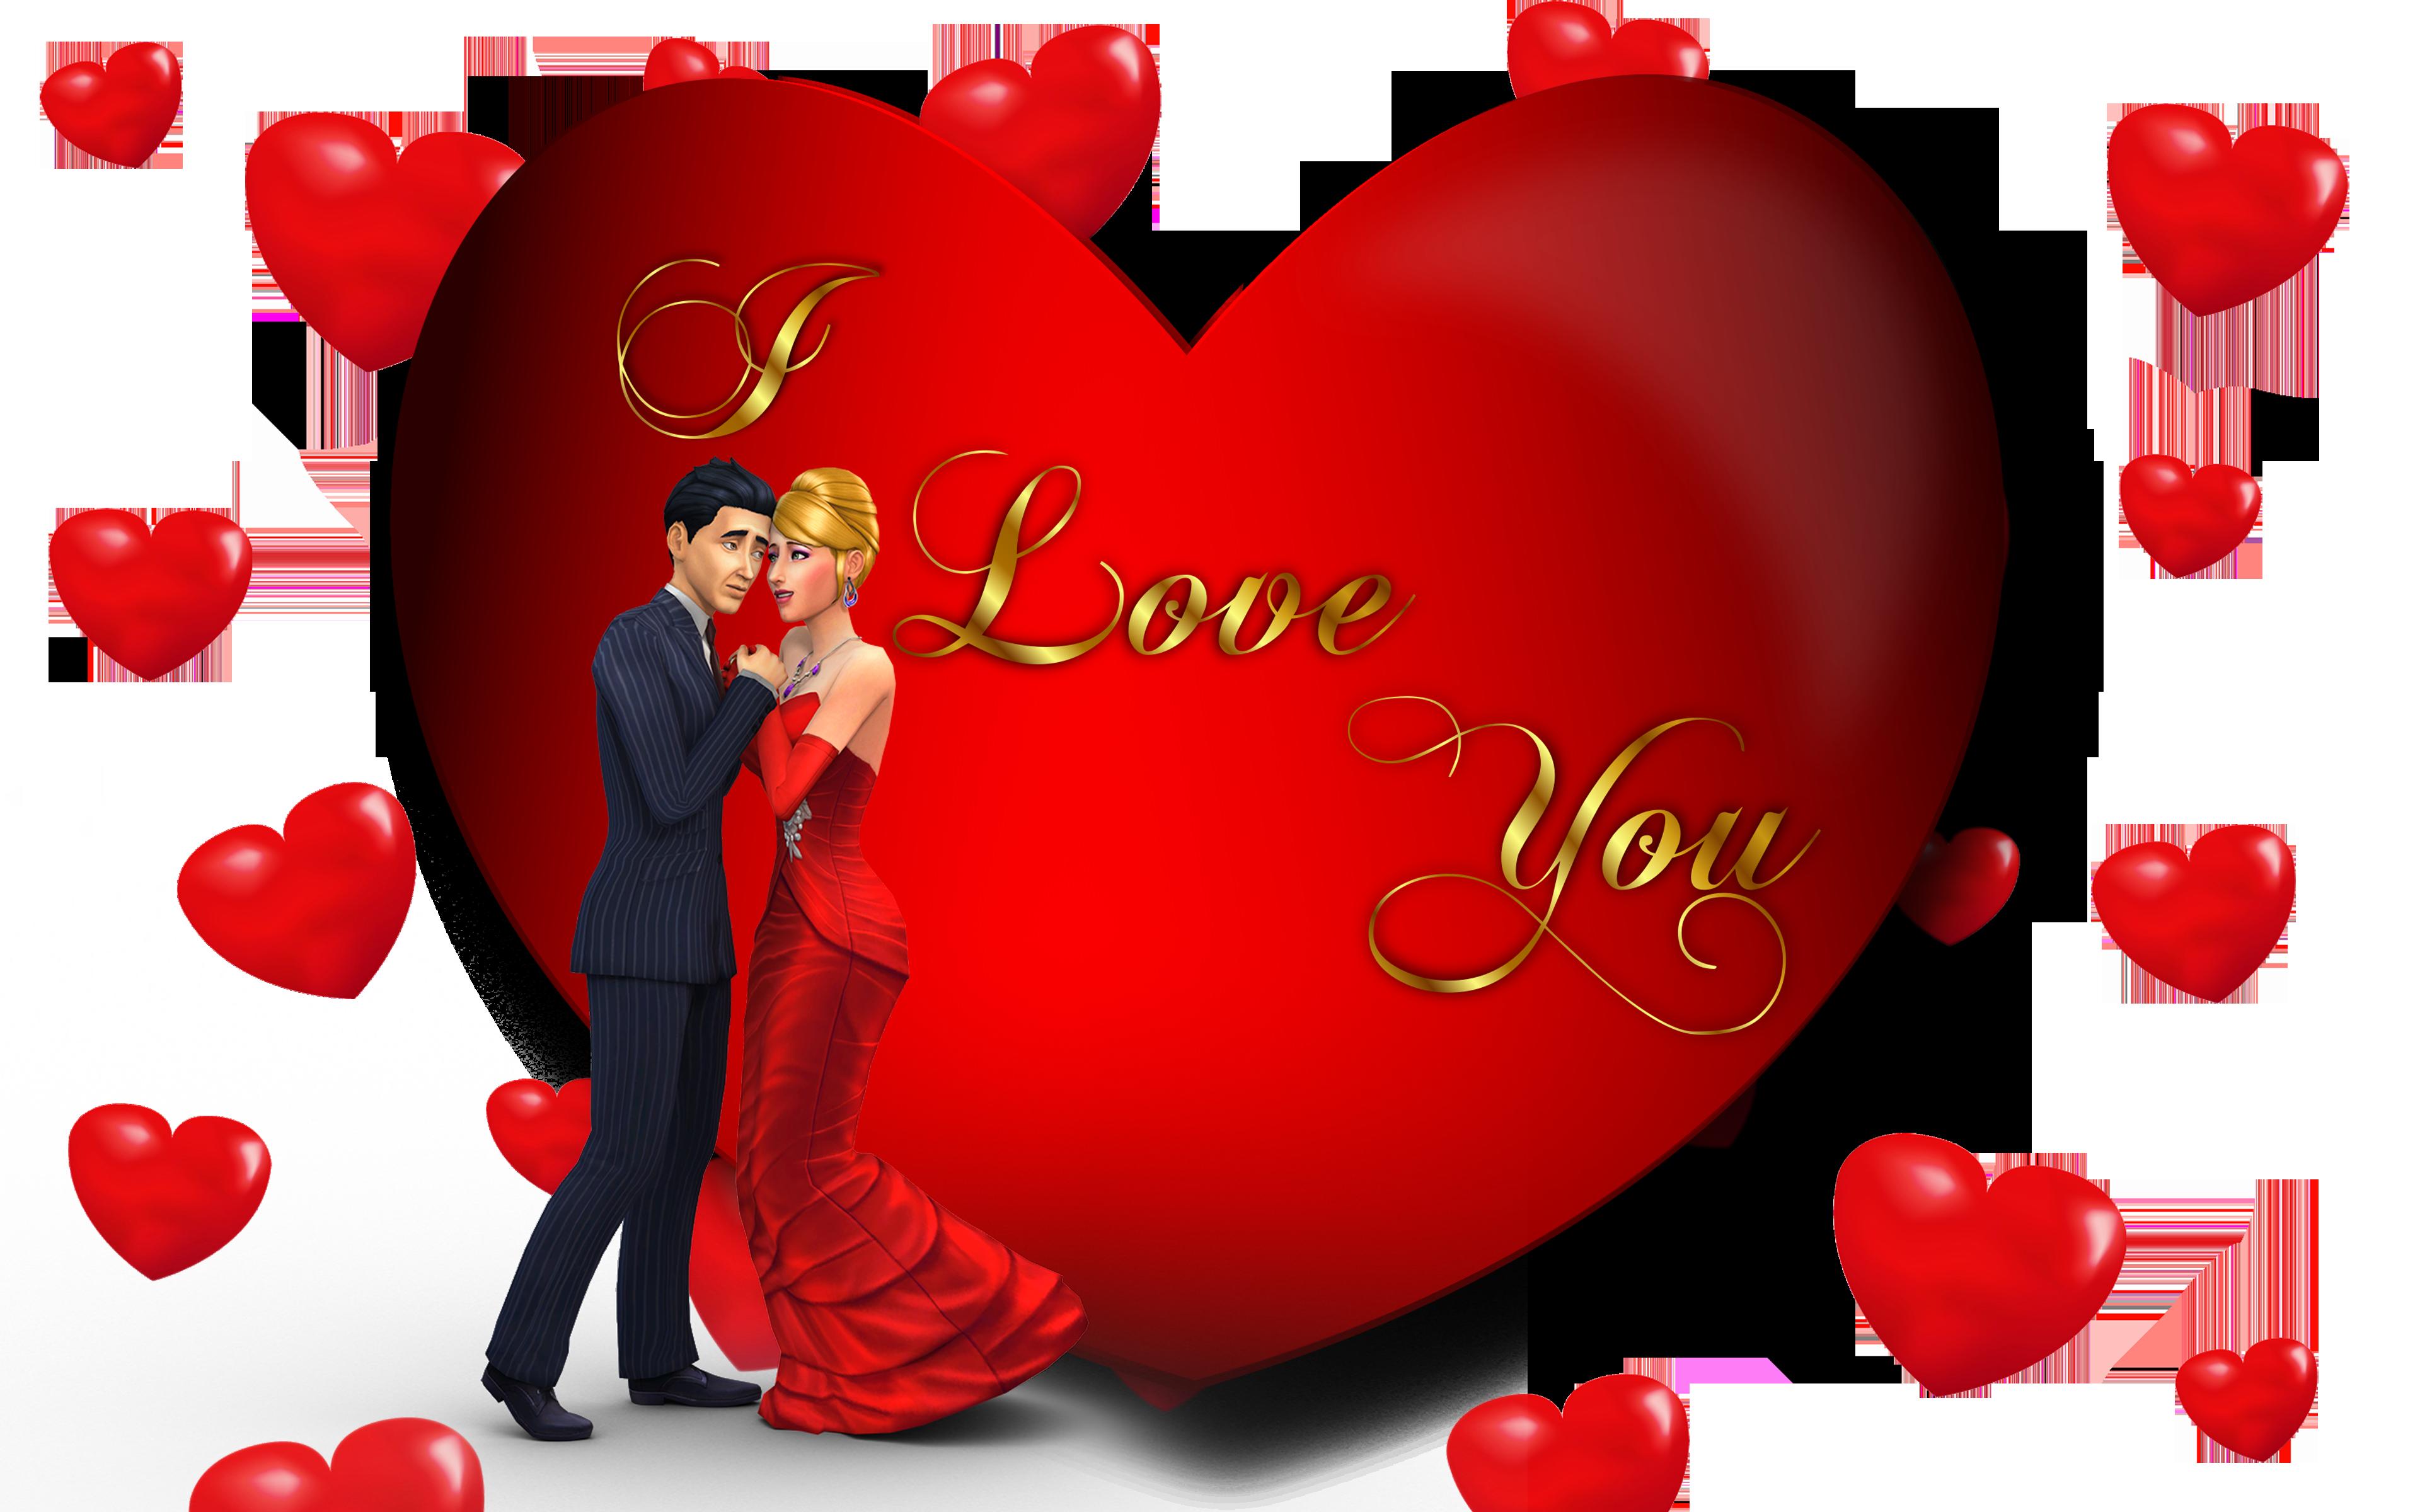 I Love U Wallpaper With Couple 3840x2400 Download Hd Wallpaper Wallpapertip